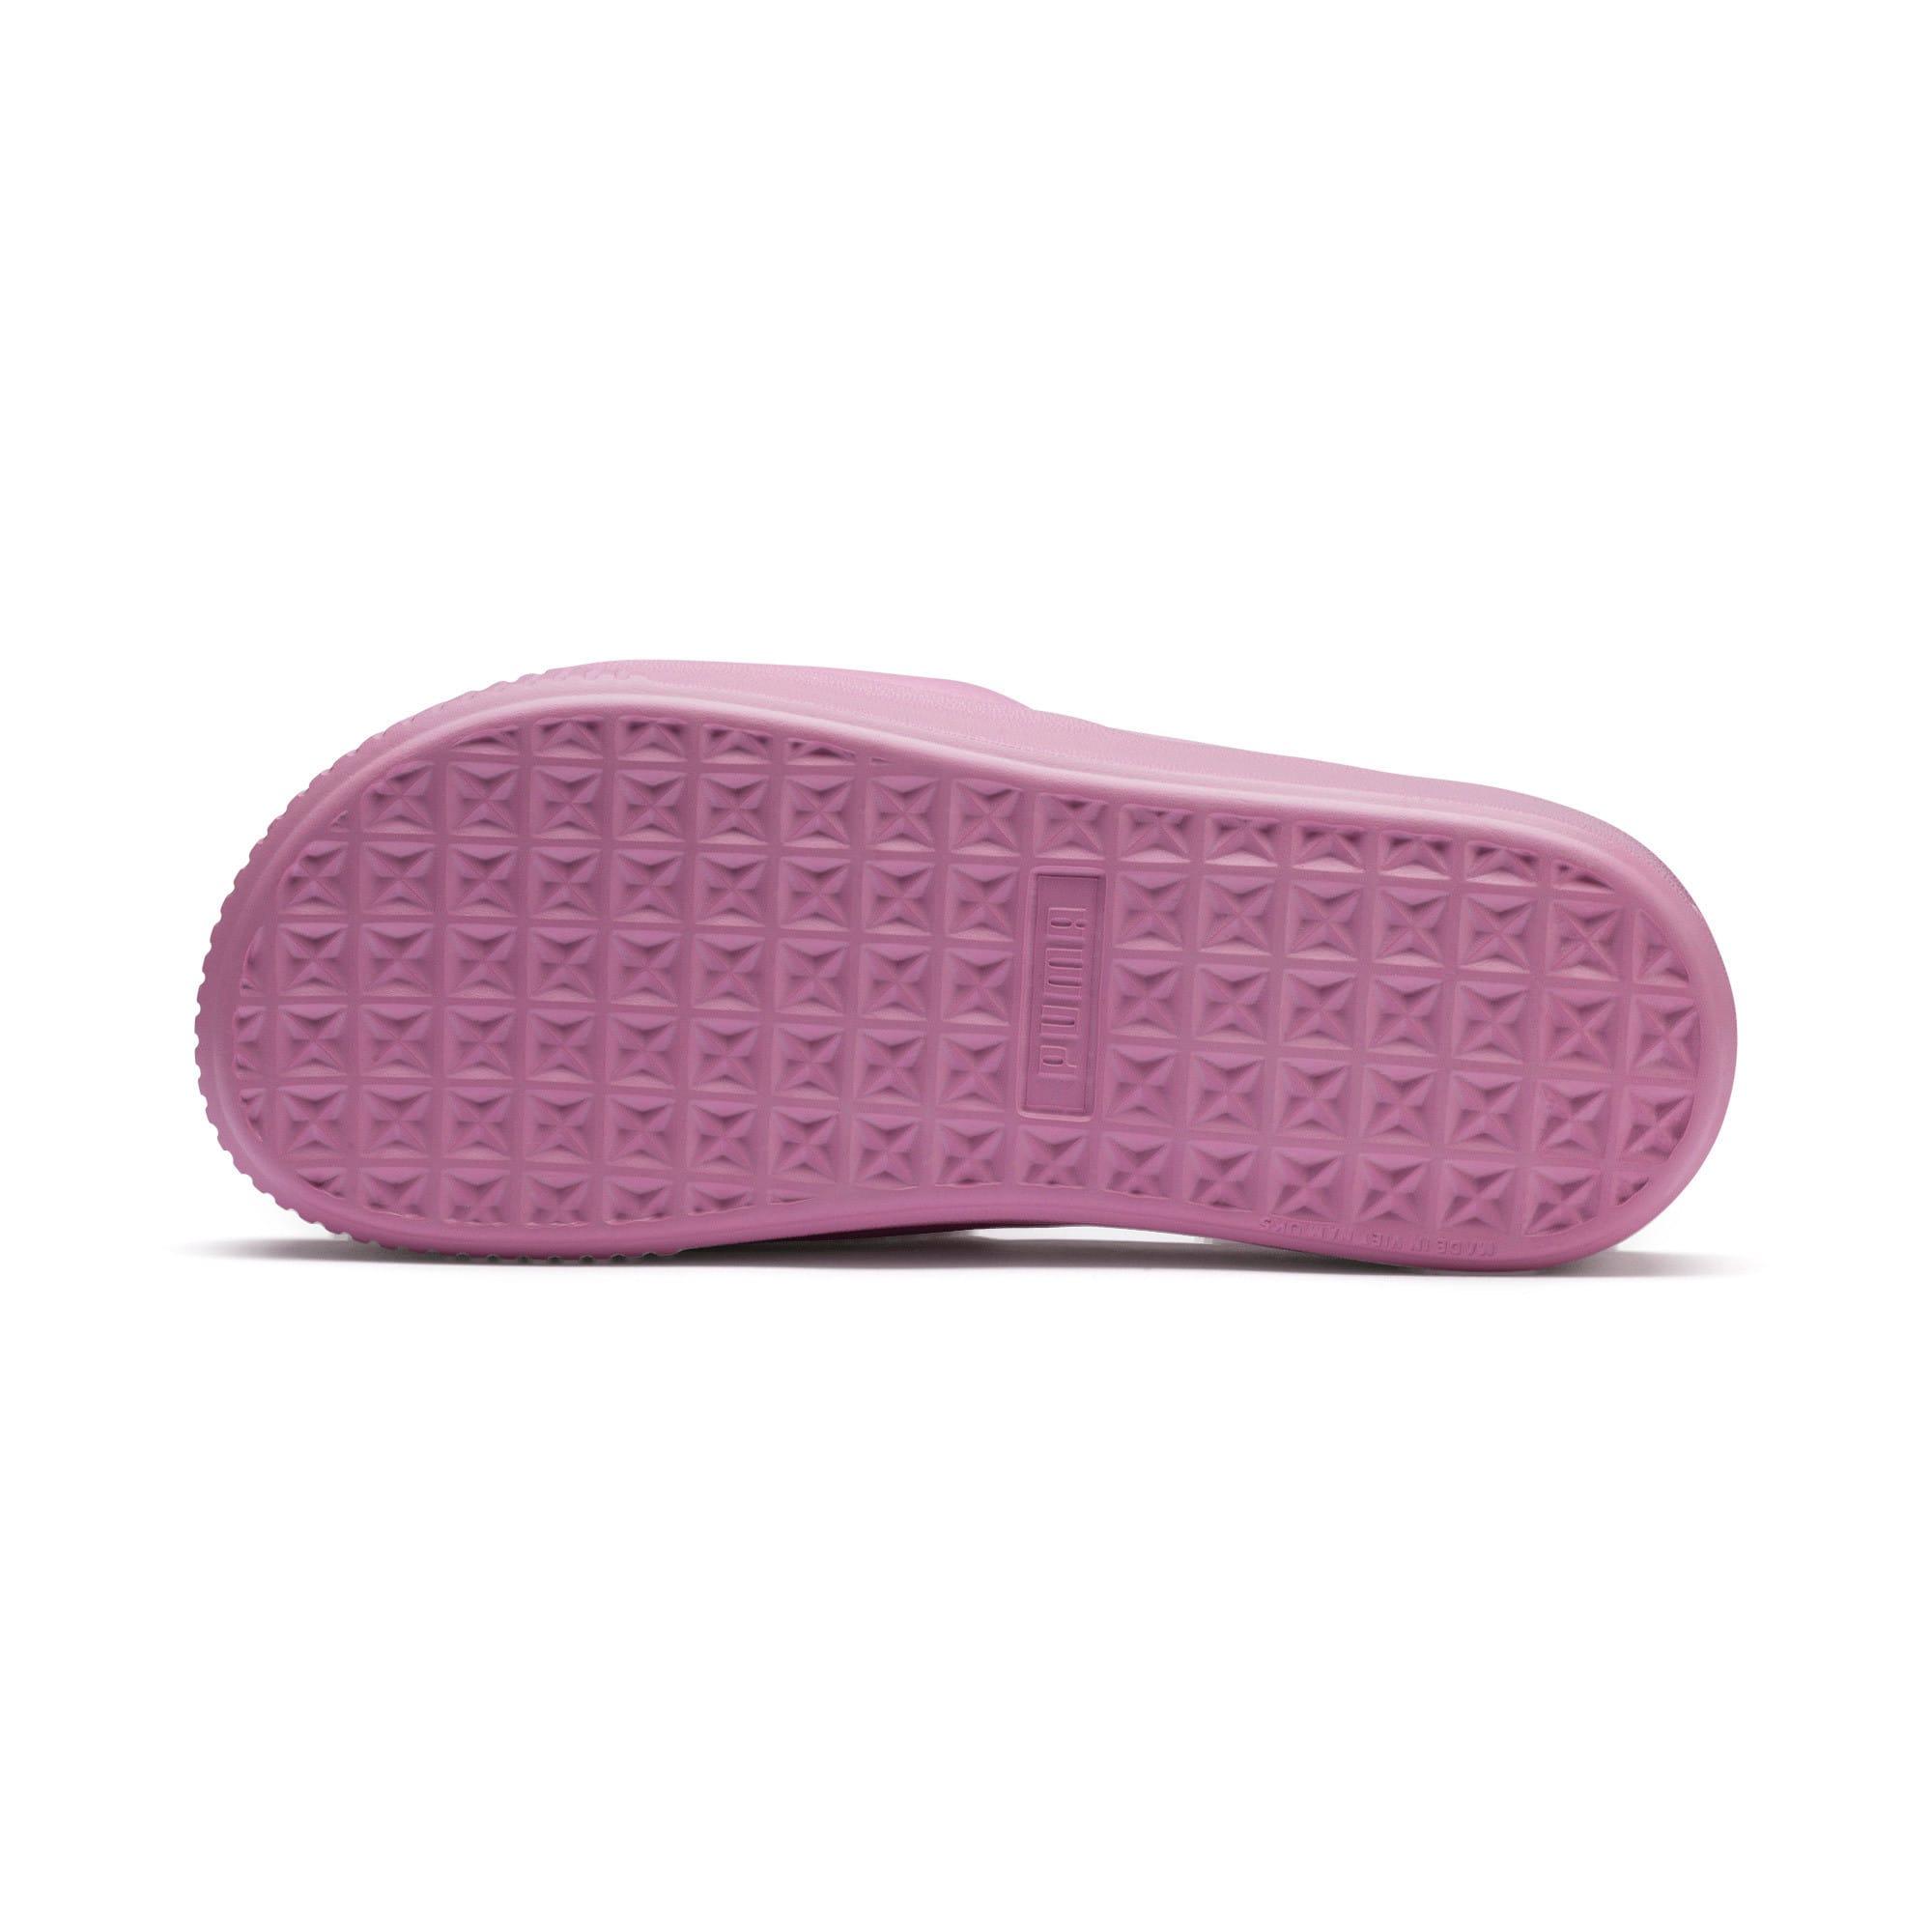 Miniatura 4 de Sandalias con plataforma Slide para mujer, Pale Pink-Pale Pink, mediano